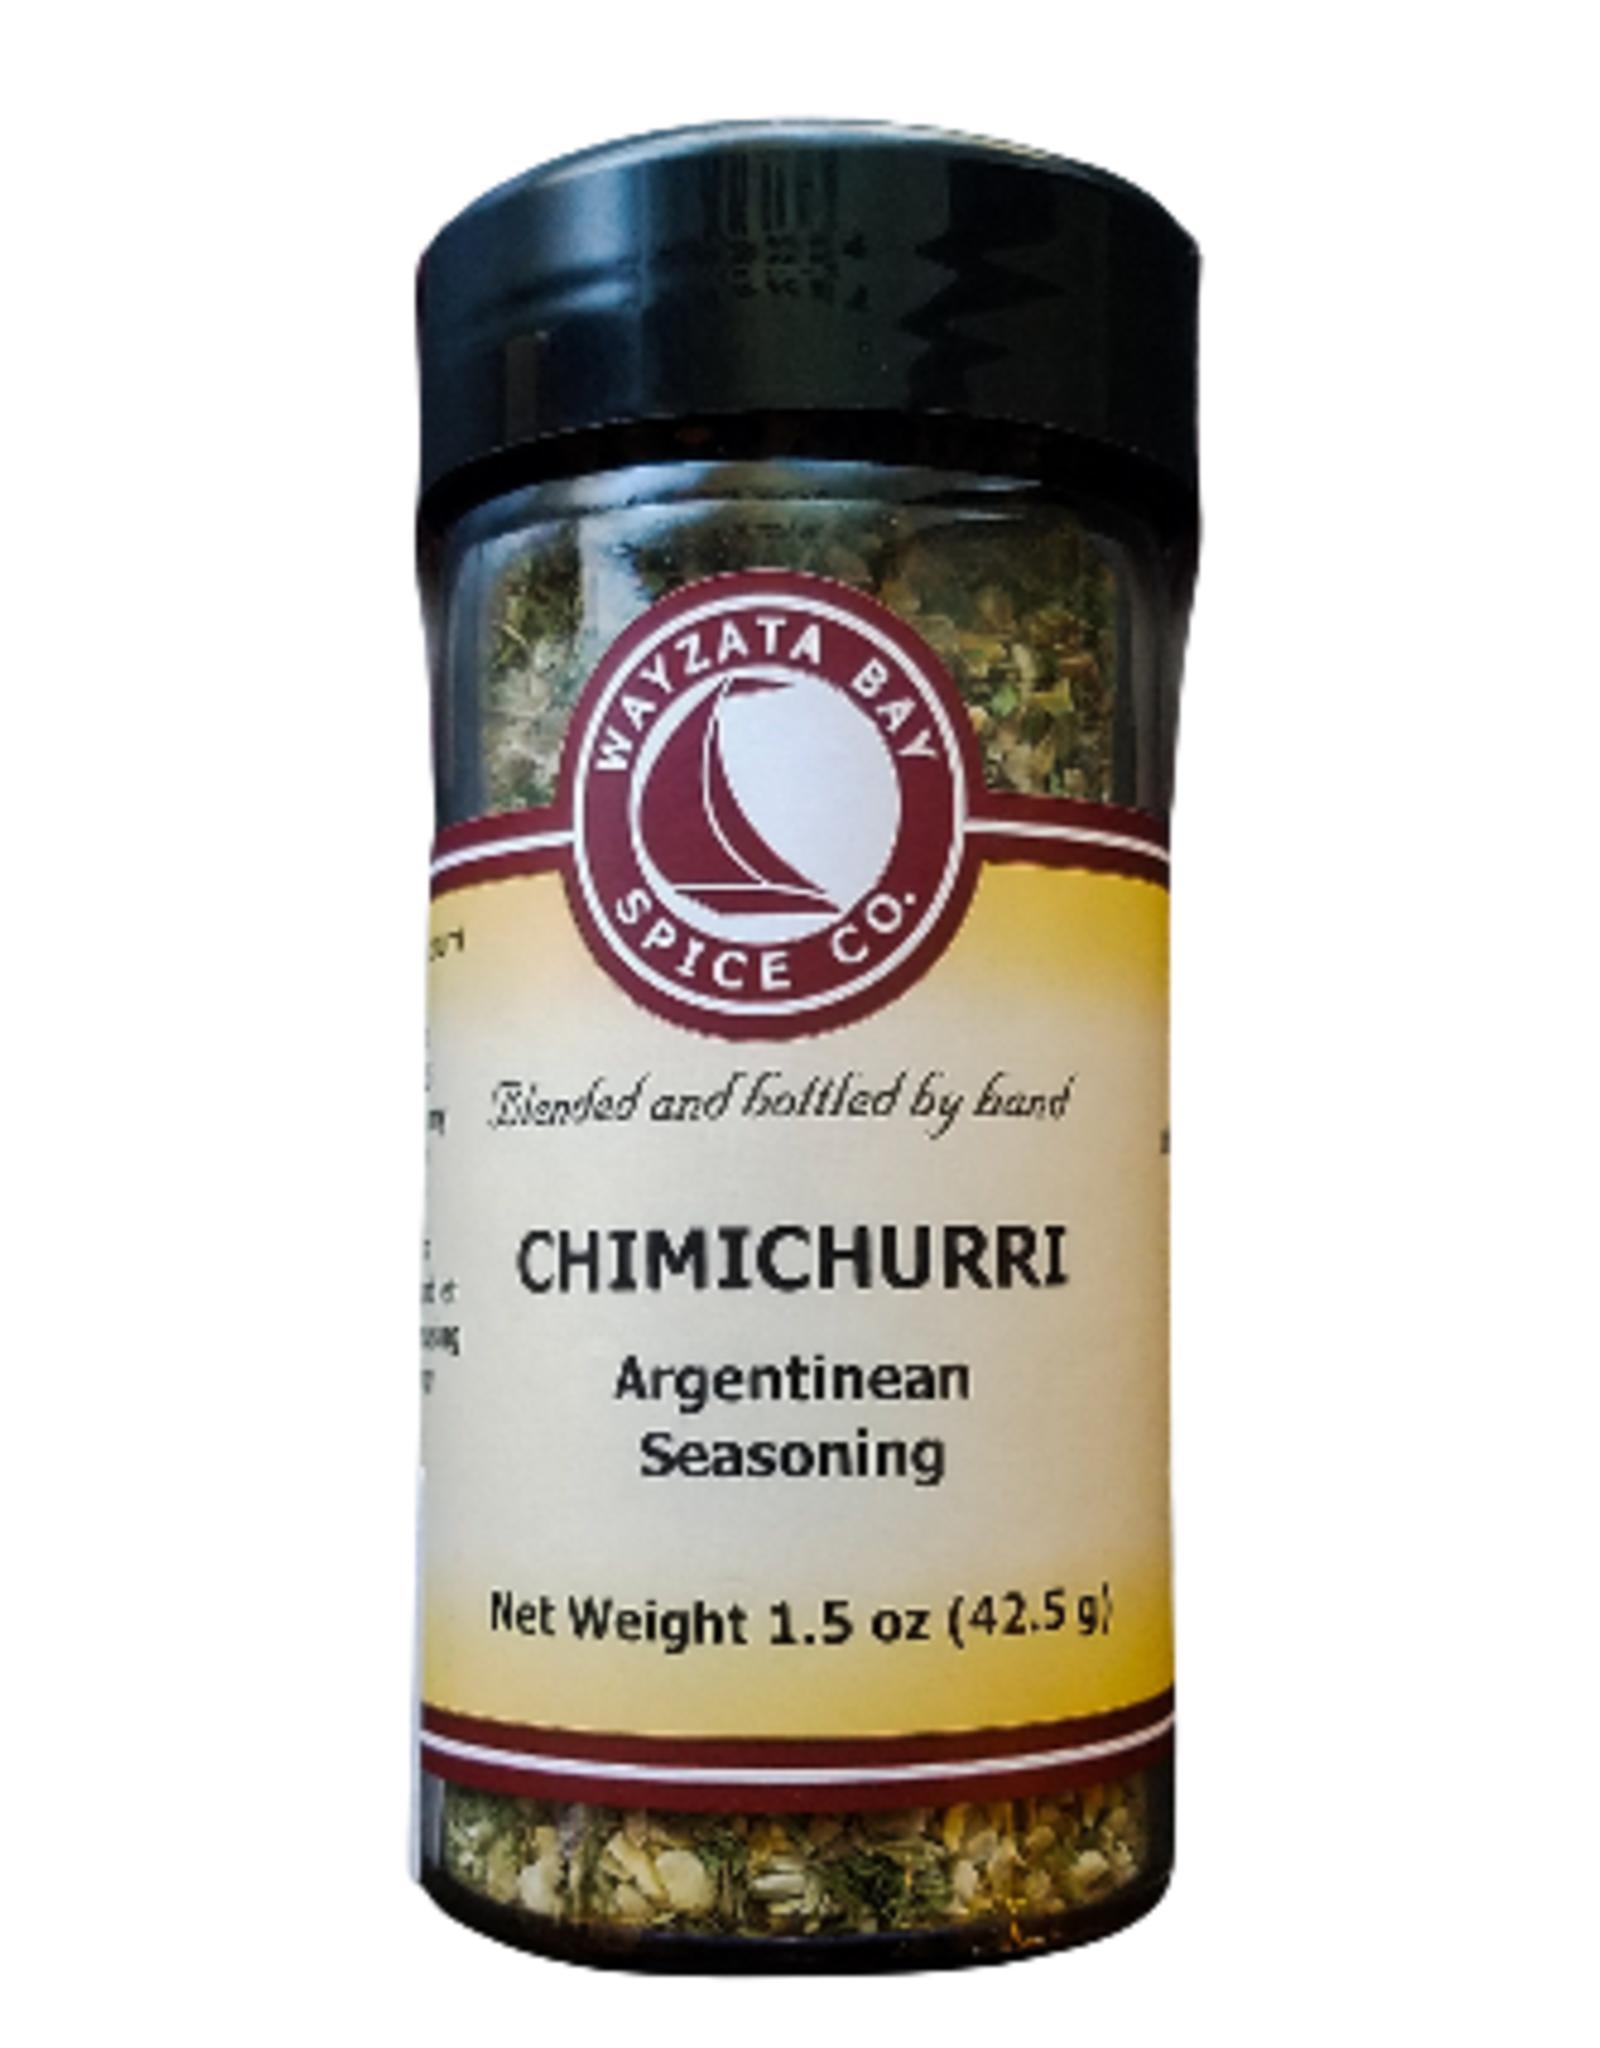 Wayzata Bay Spice Co. Chimichurri Seasoning